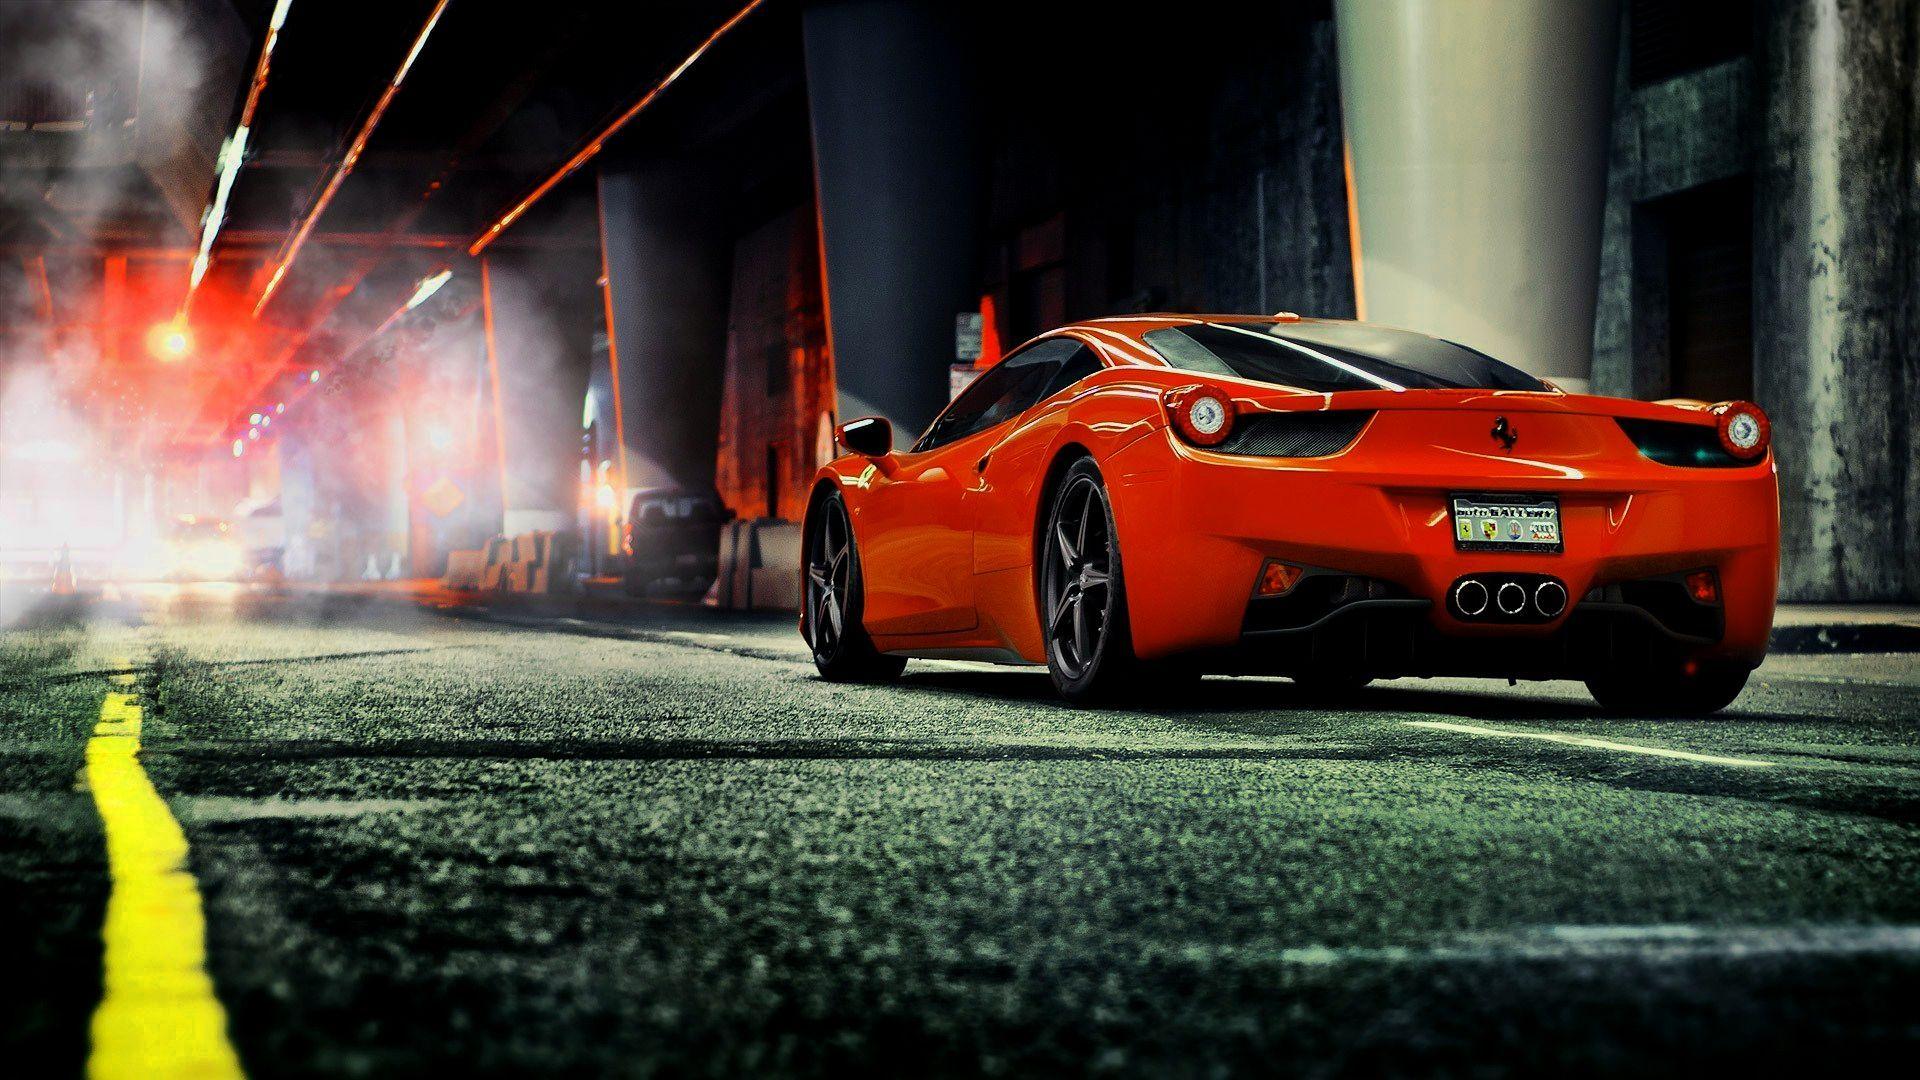 Hd Wallpaper Ferrari